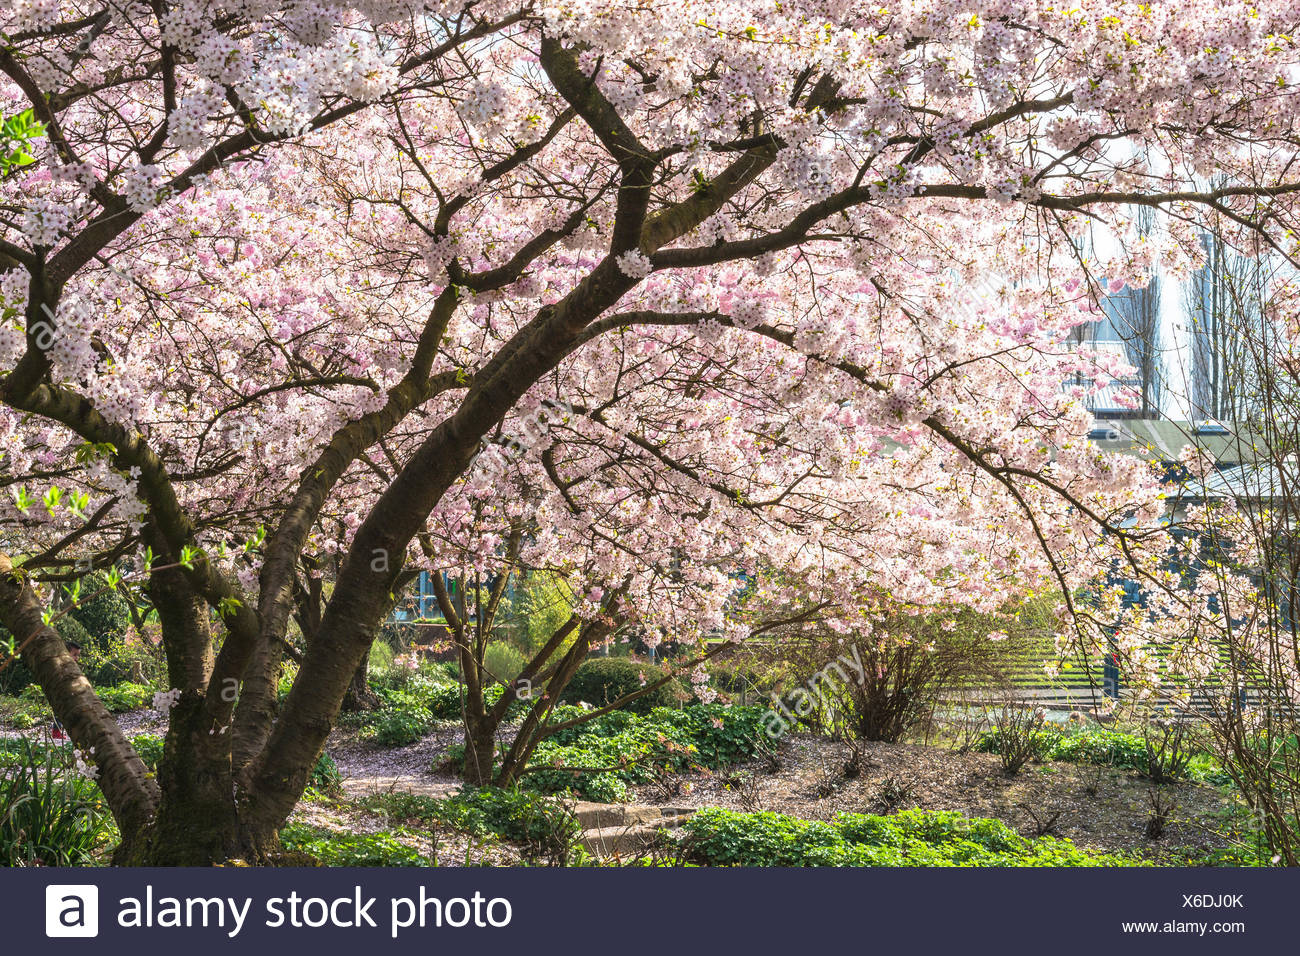 Rosa Baumblüten im Frühling vor blauen Himmel. Stock Photo